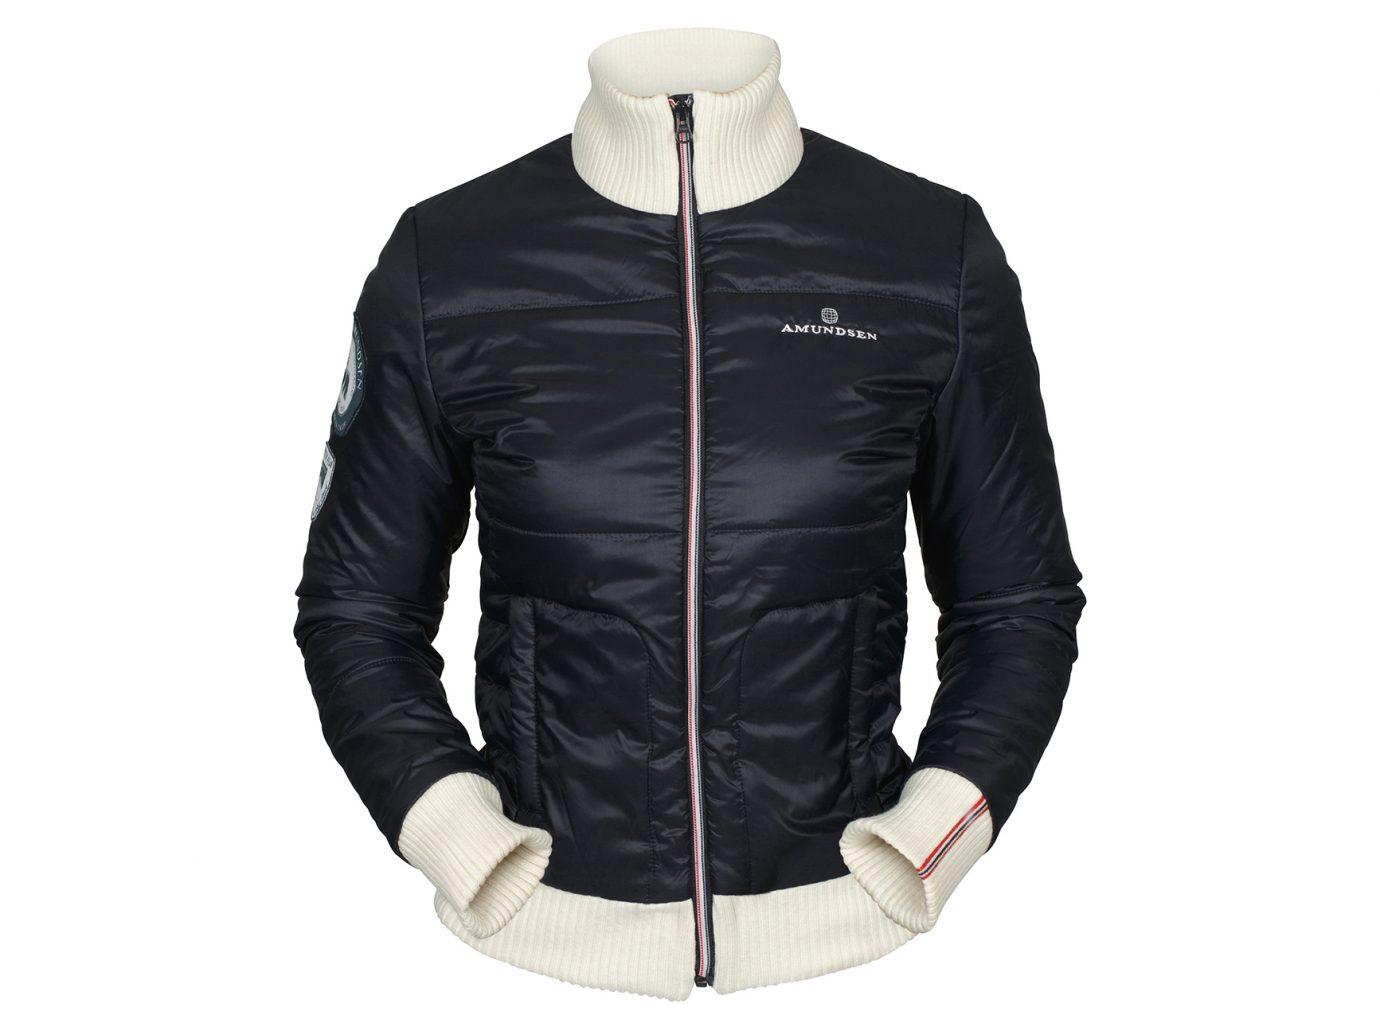 Amundson Sports Breguet Jacket